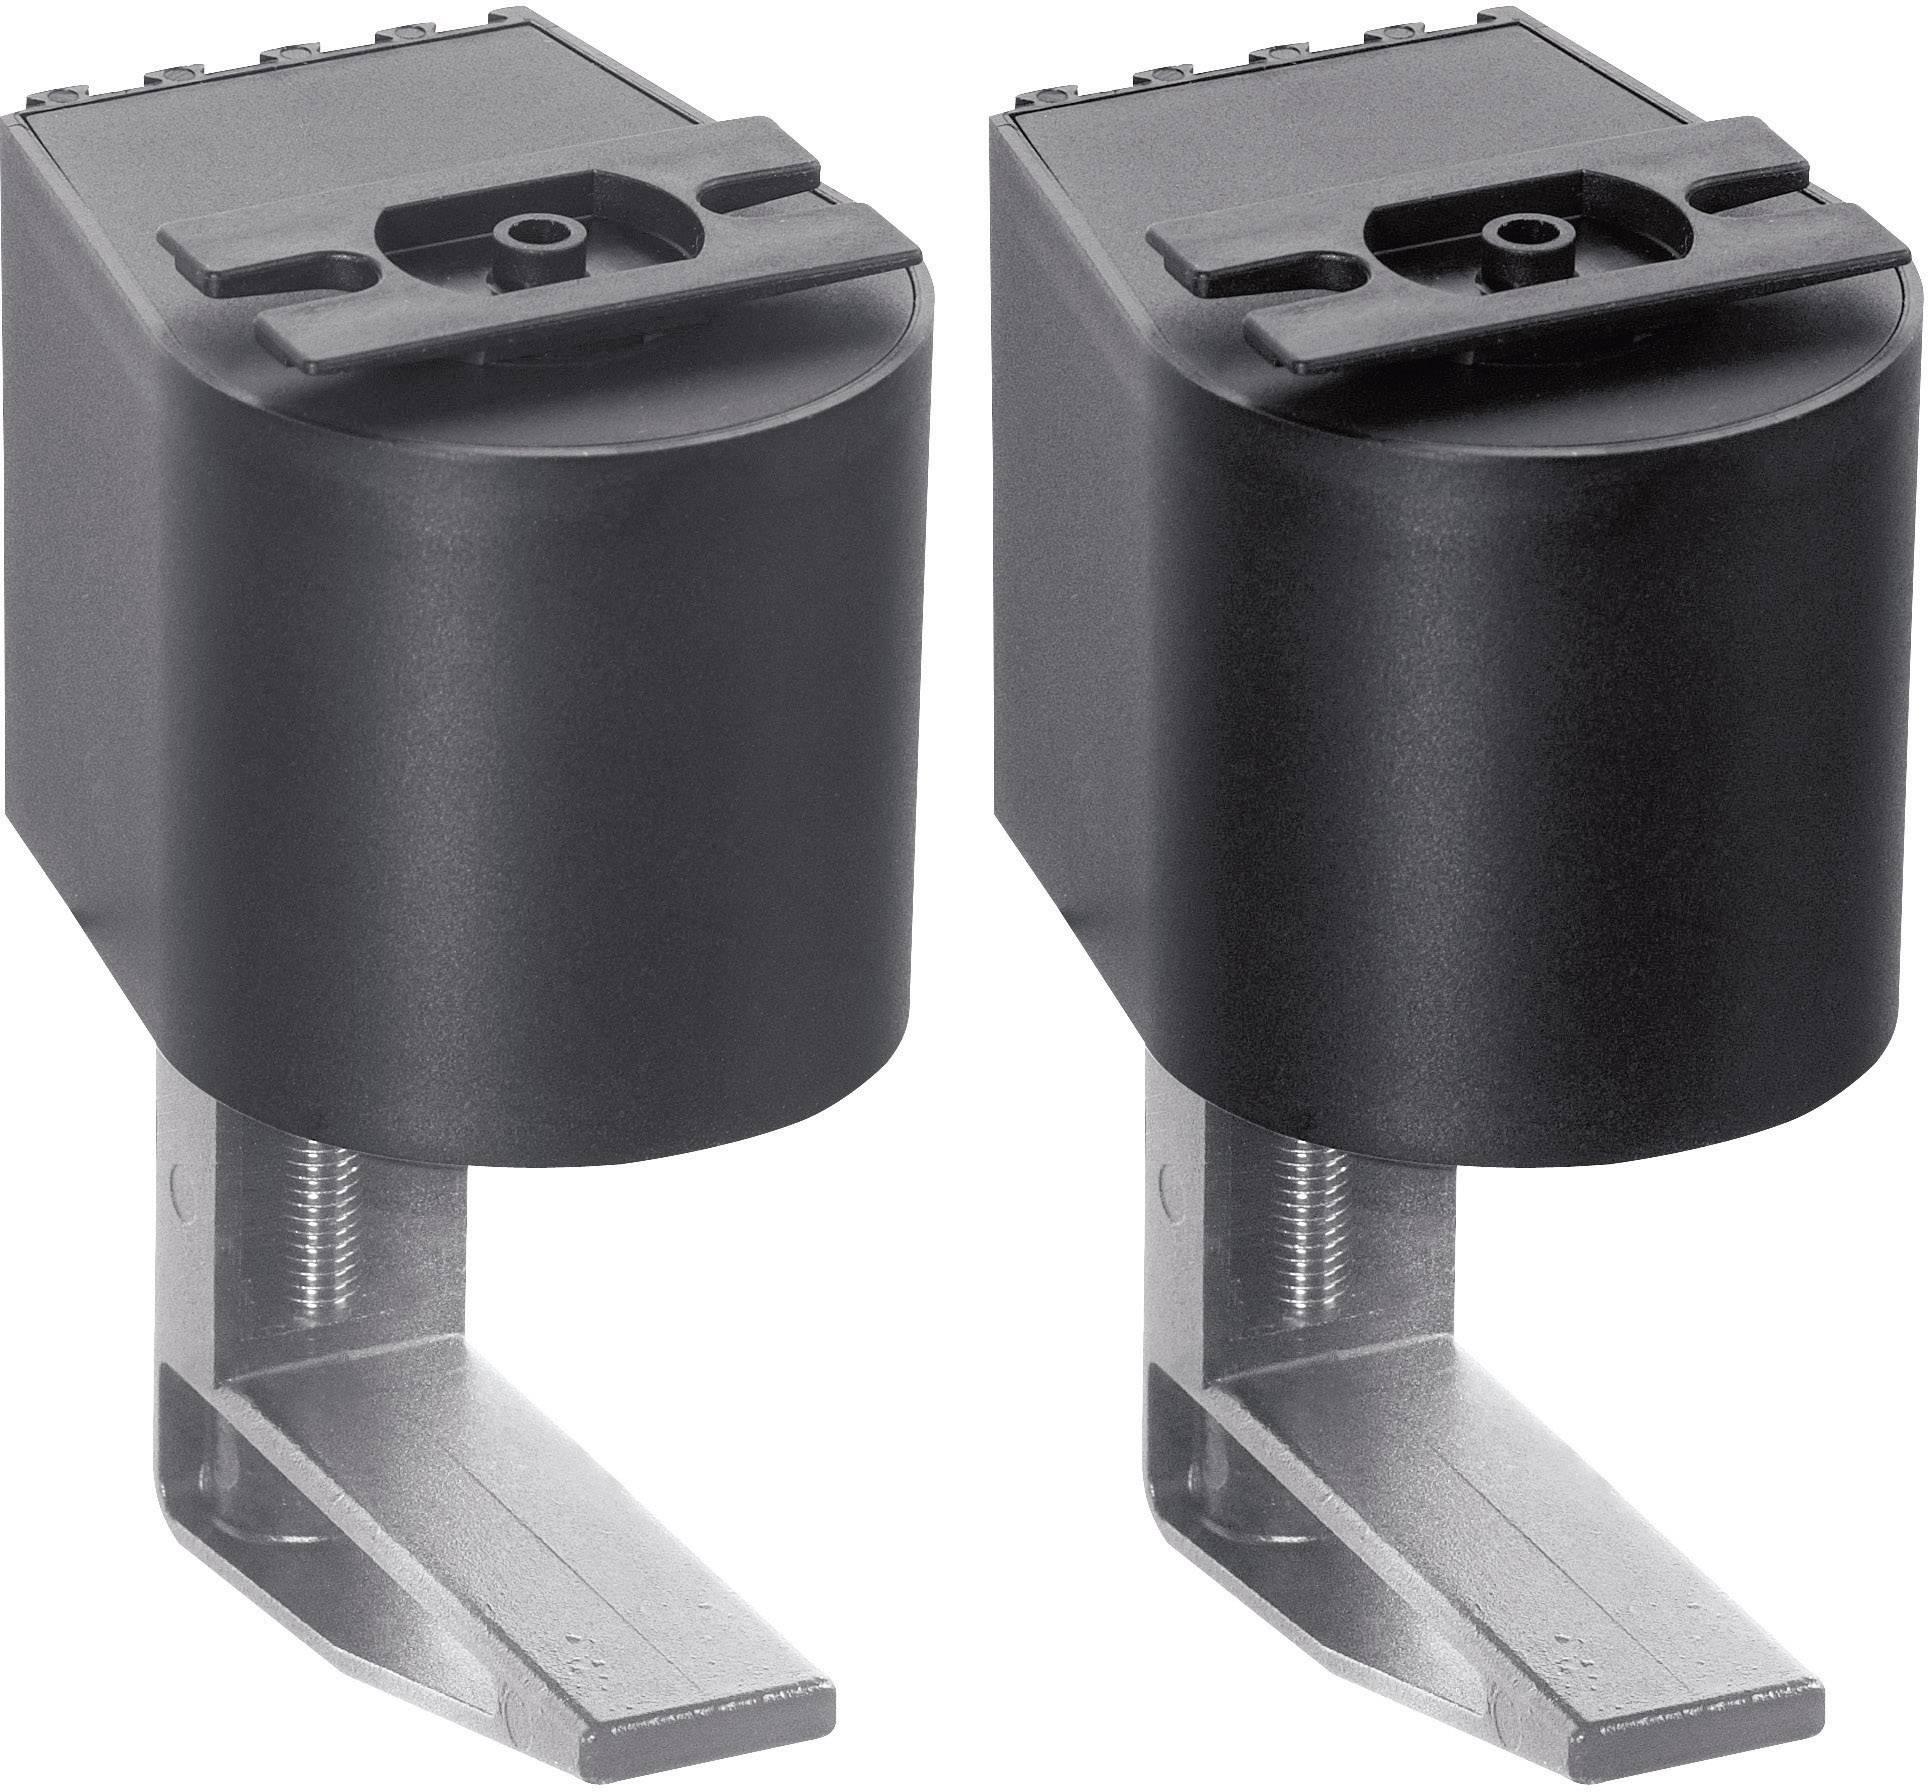 Montážní úchytka Schulte Elektrotechnik, 99090205, 8-40 mm, sada 2 ks, černá